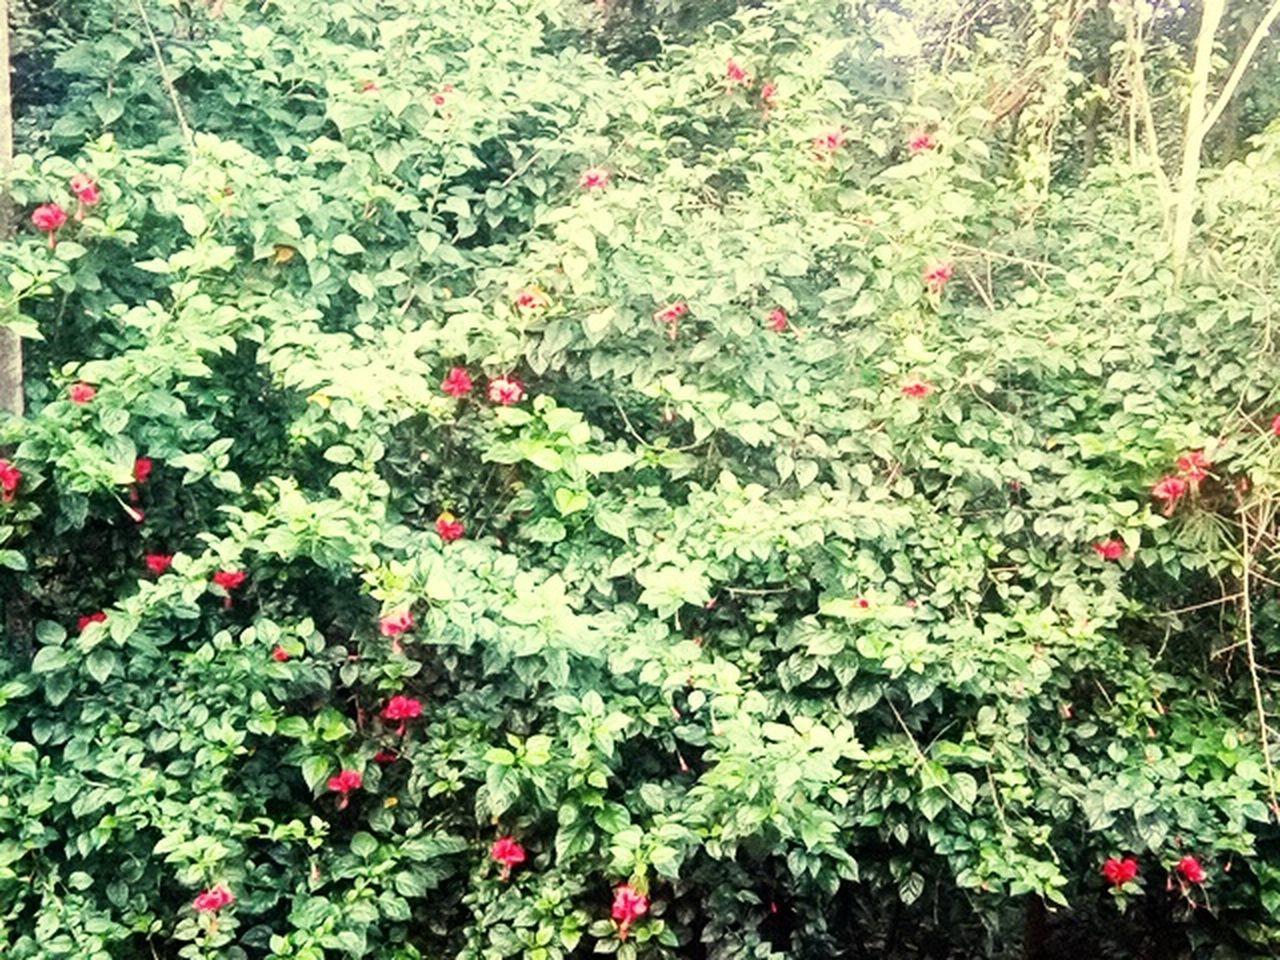 foliage, vegetation, spring, green, botanical, growth, shrub, summer, garden, bush, colorful, flower, blossom, red, botany, nature, no people